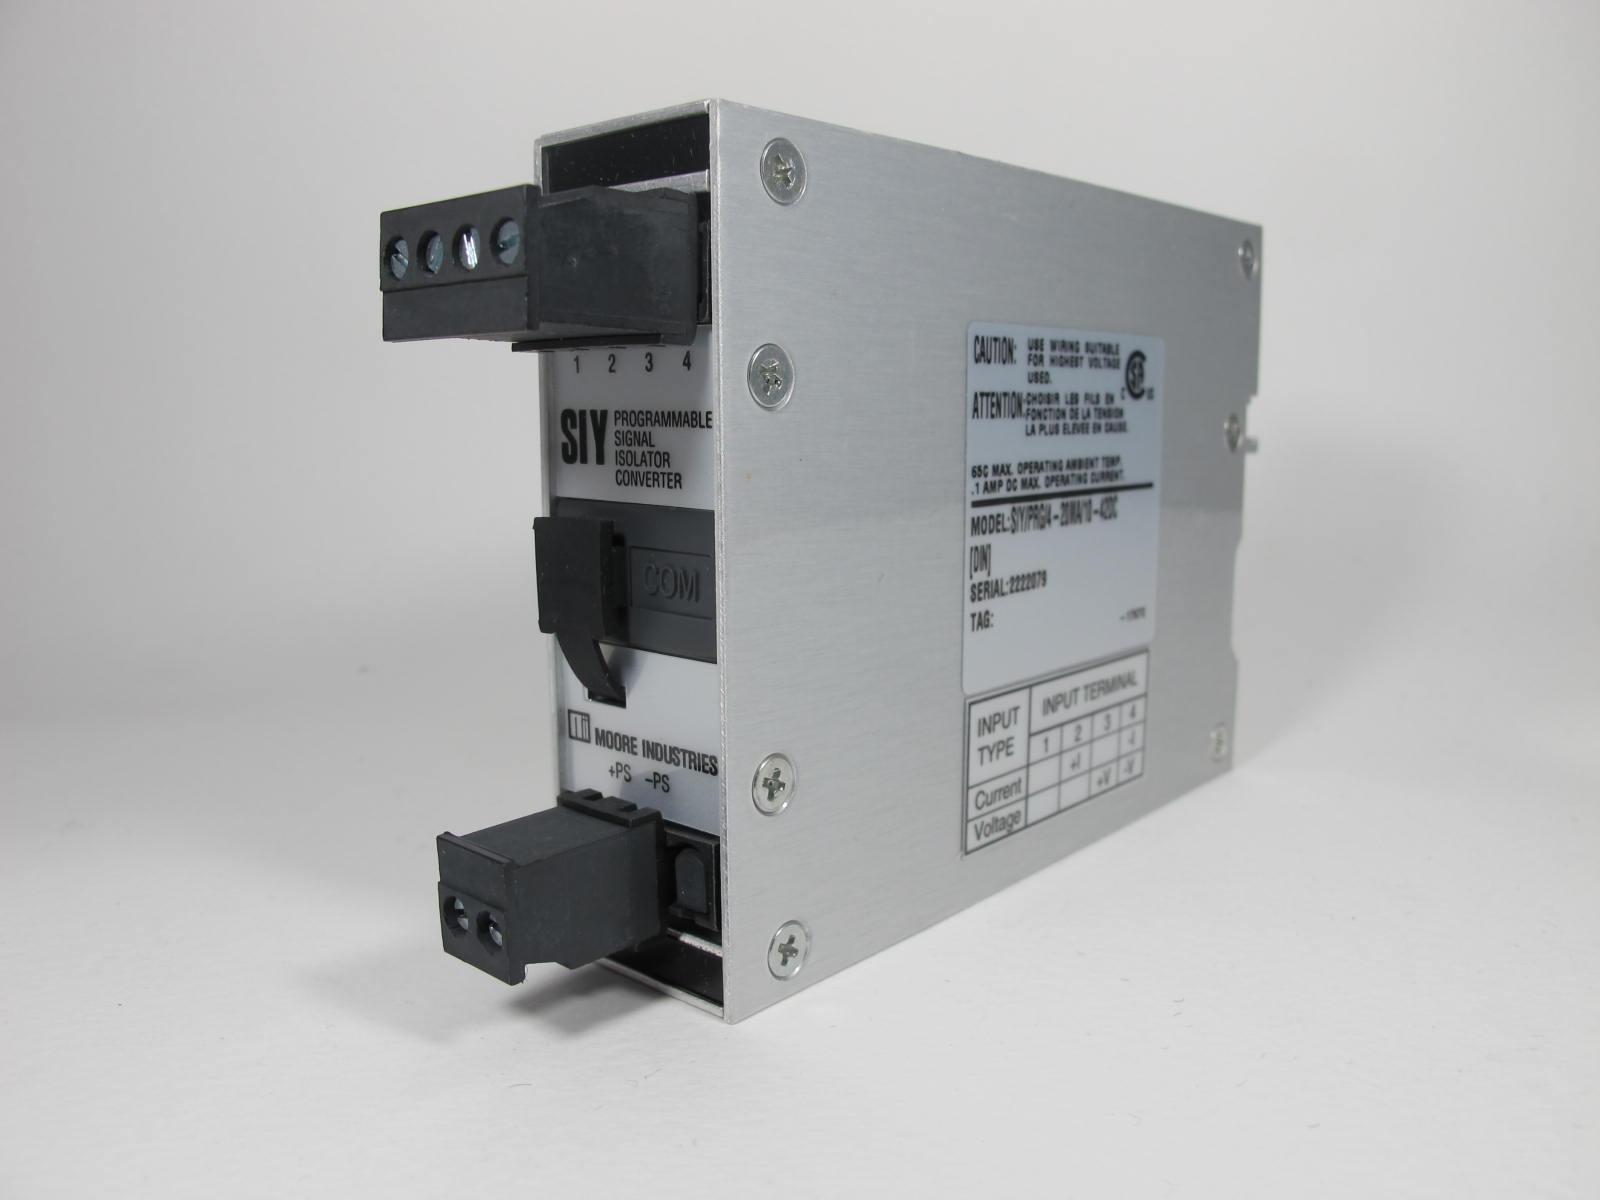 SIY/PRG/4-20MA-10-42DC [DIN] ]